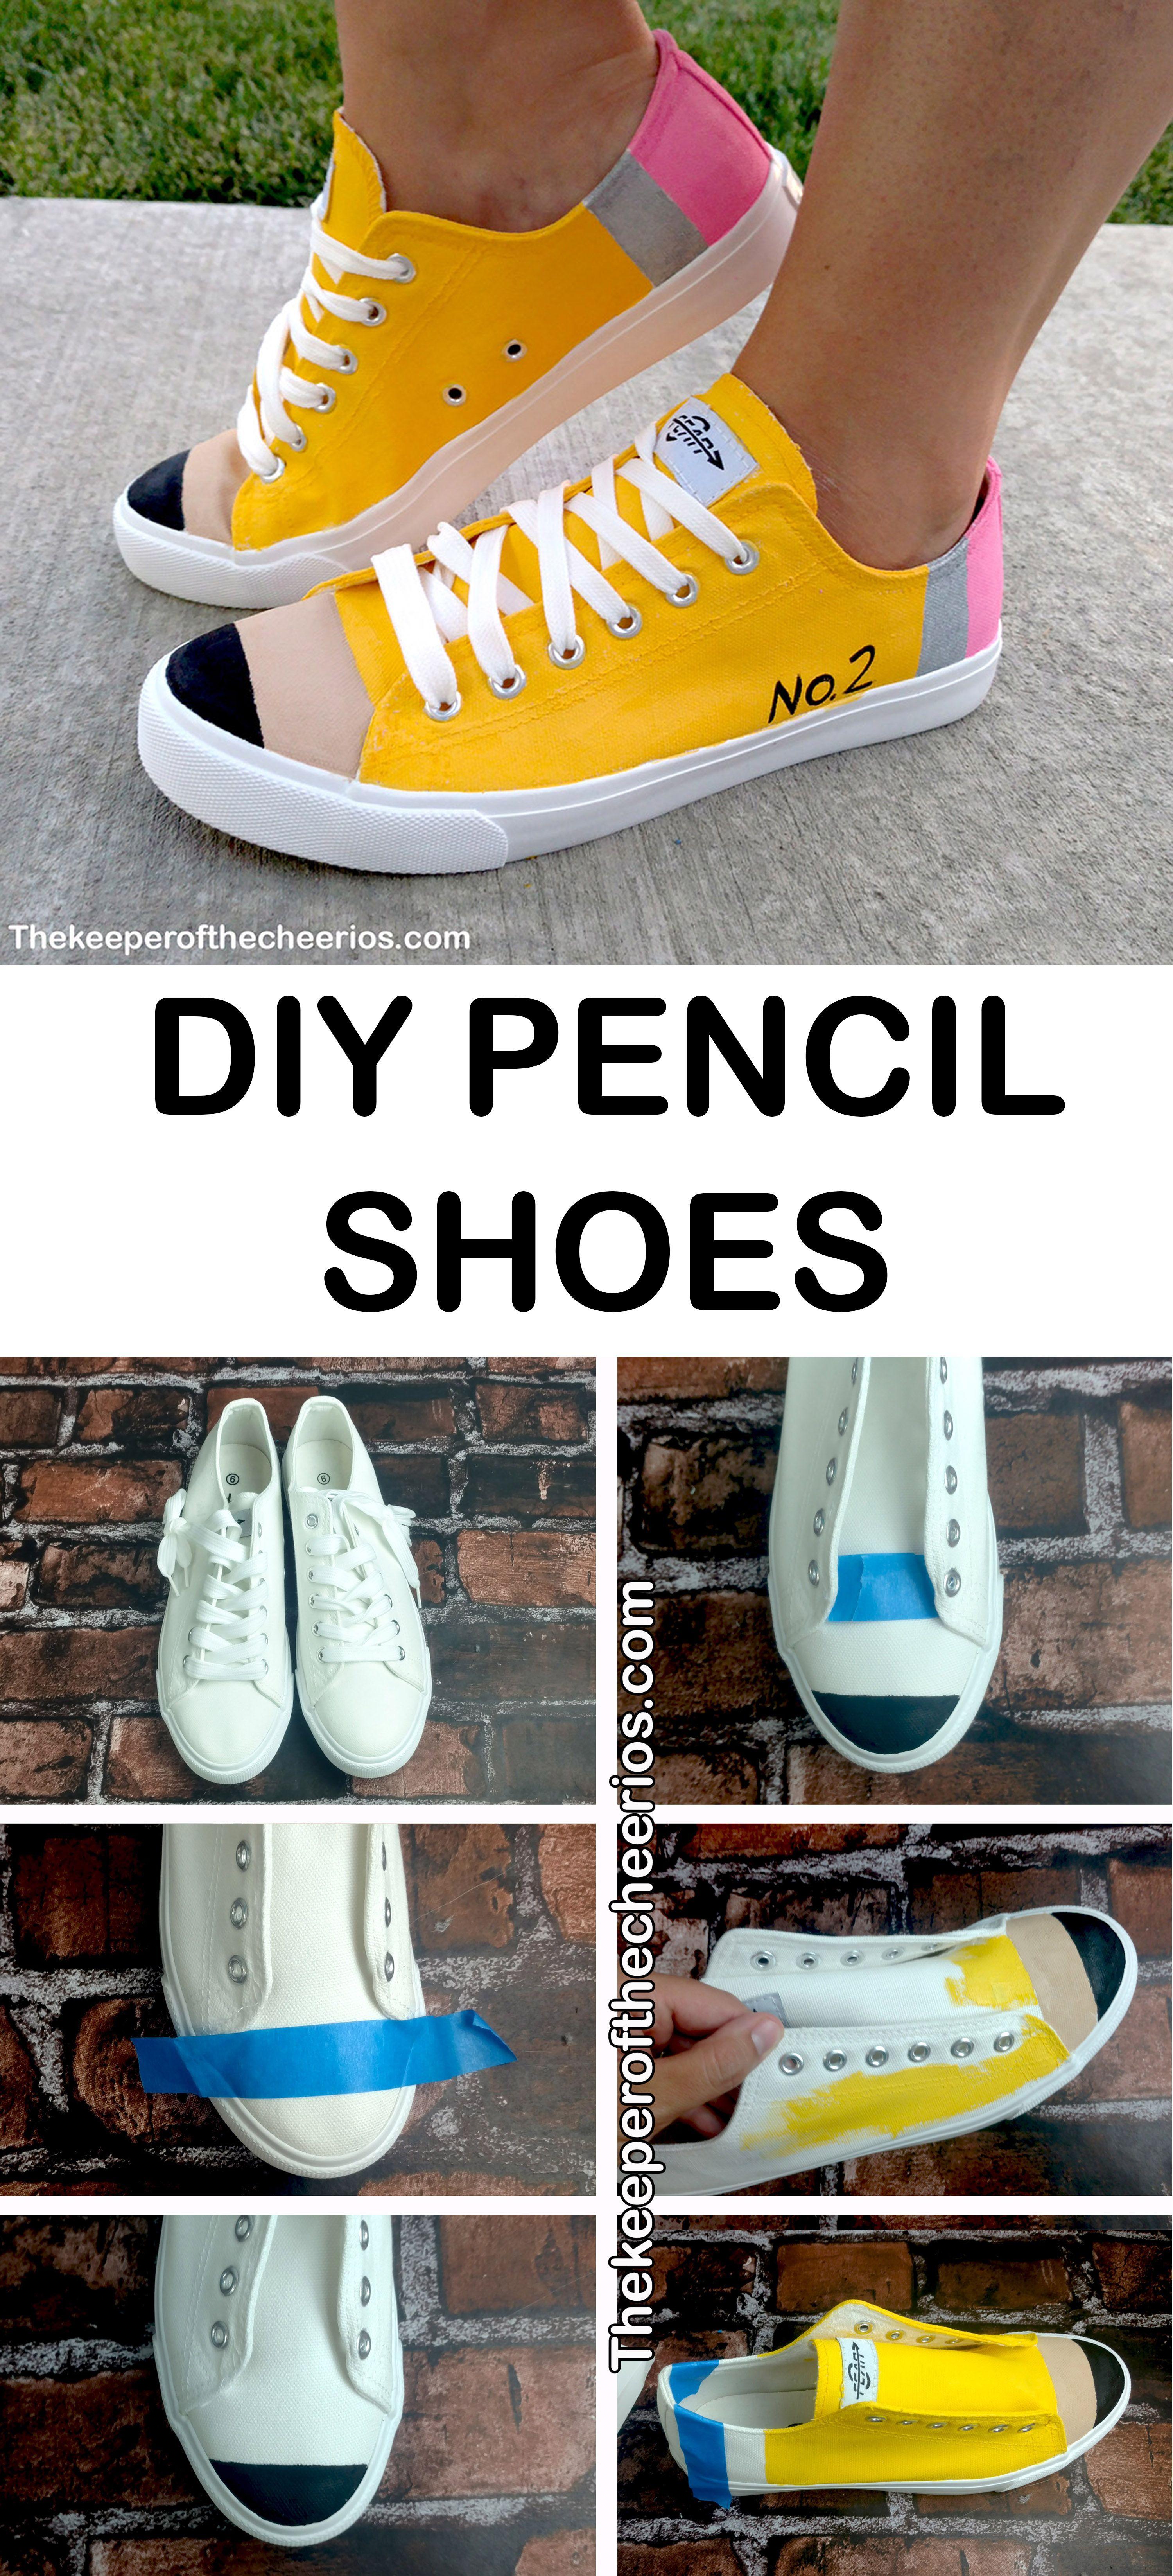 cb2de8910ce43a DIY Pencil Shoes